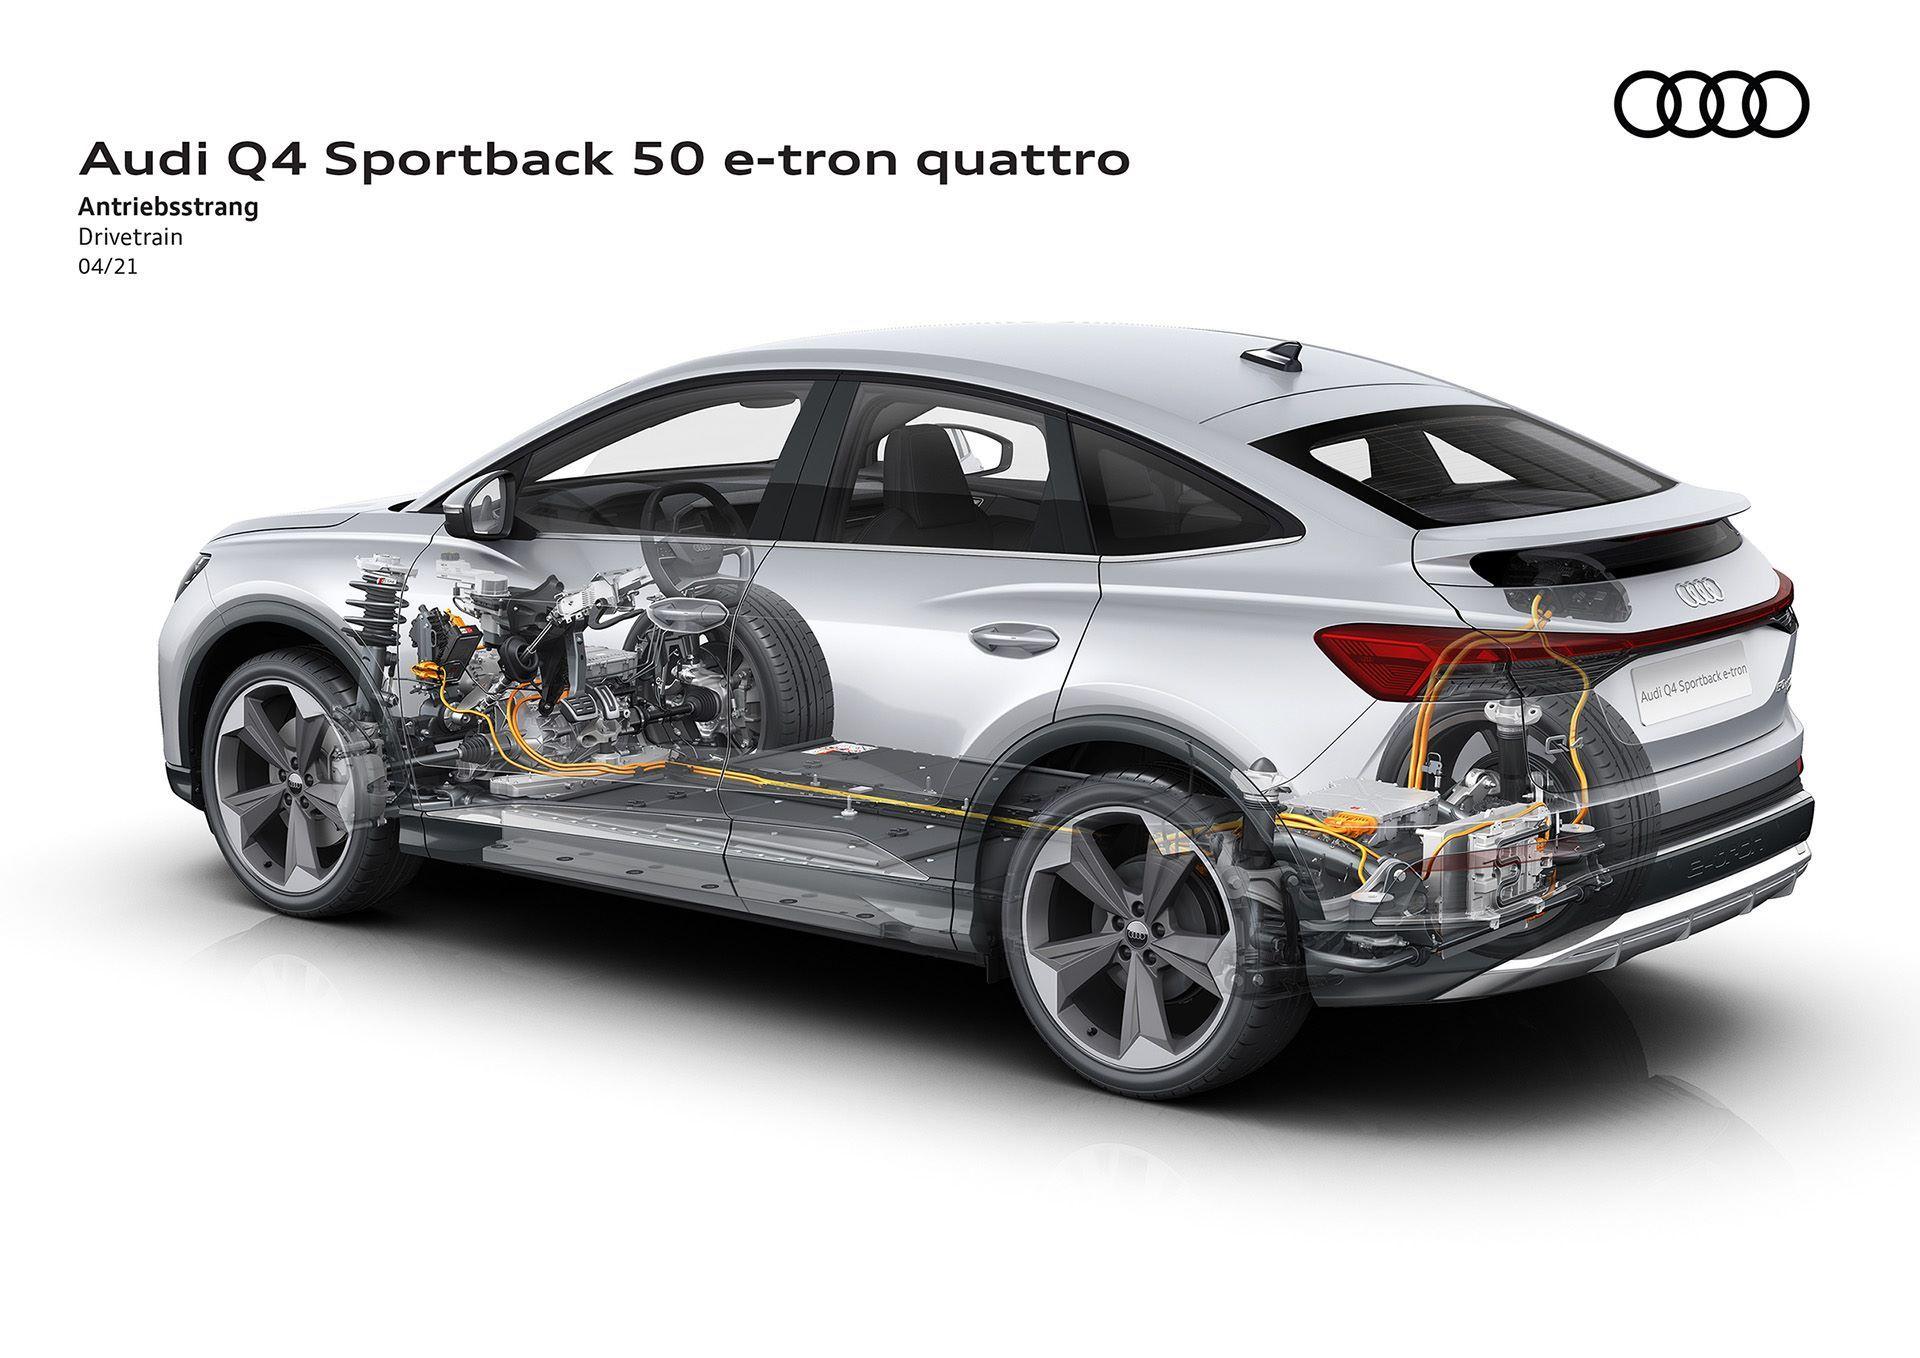 Audi-Q4-e-tron-and-Q4-e-tron-Sportback-174